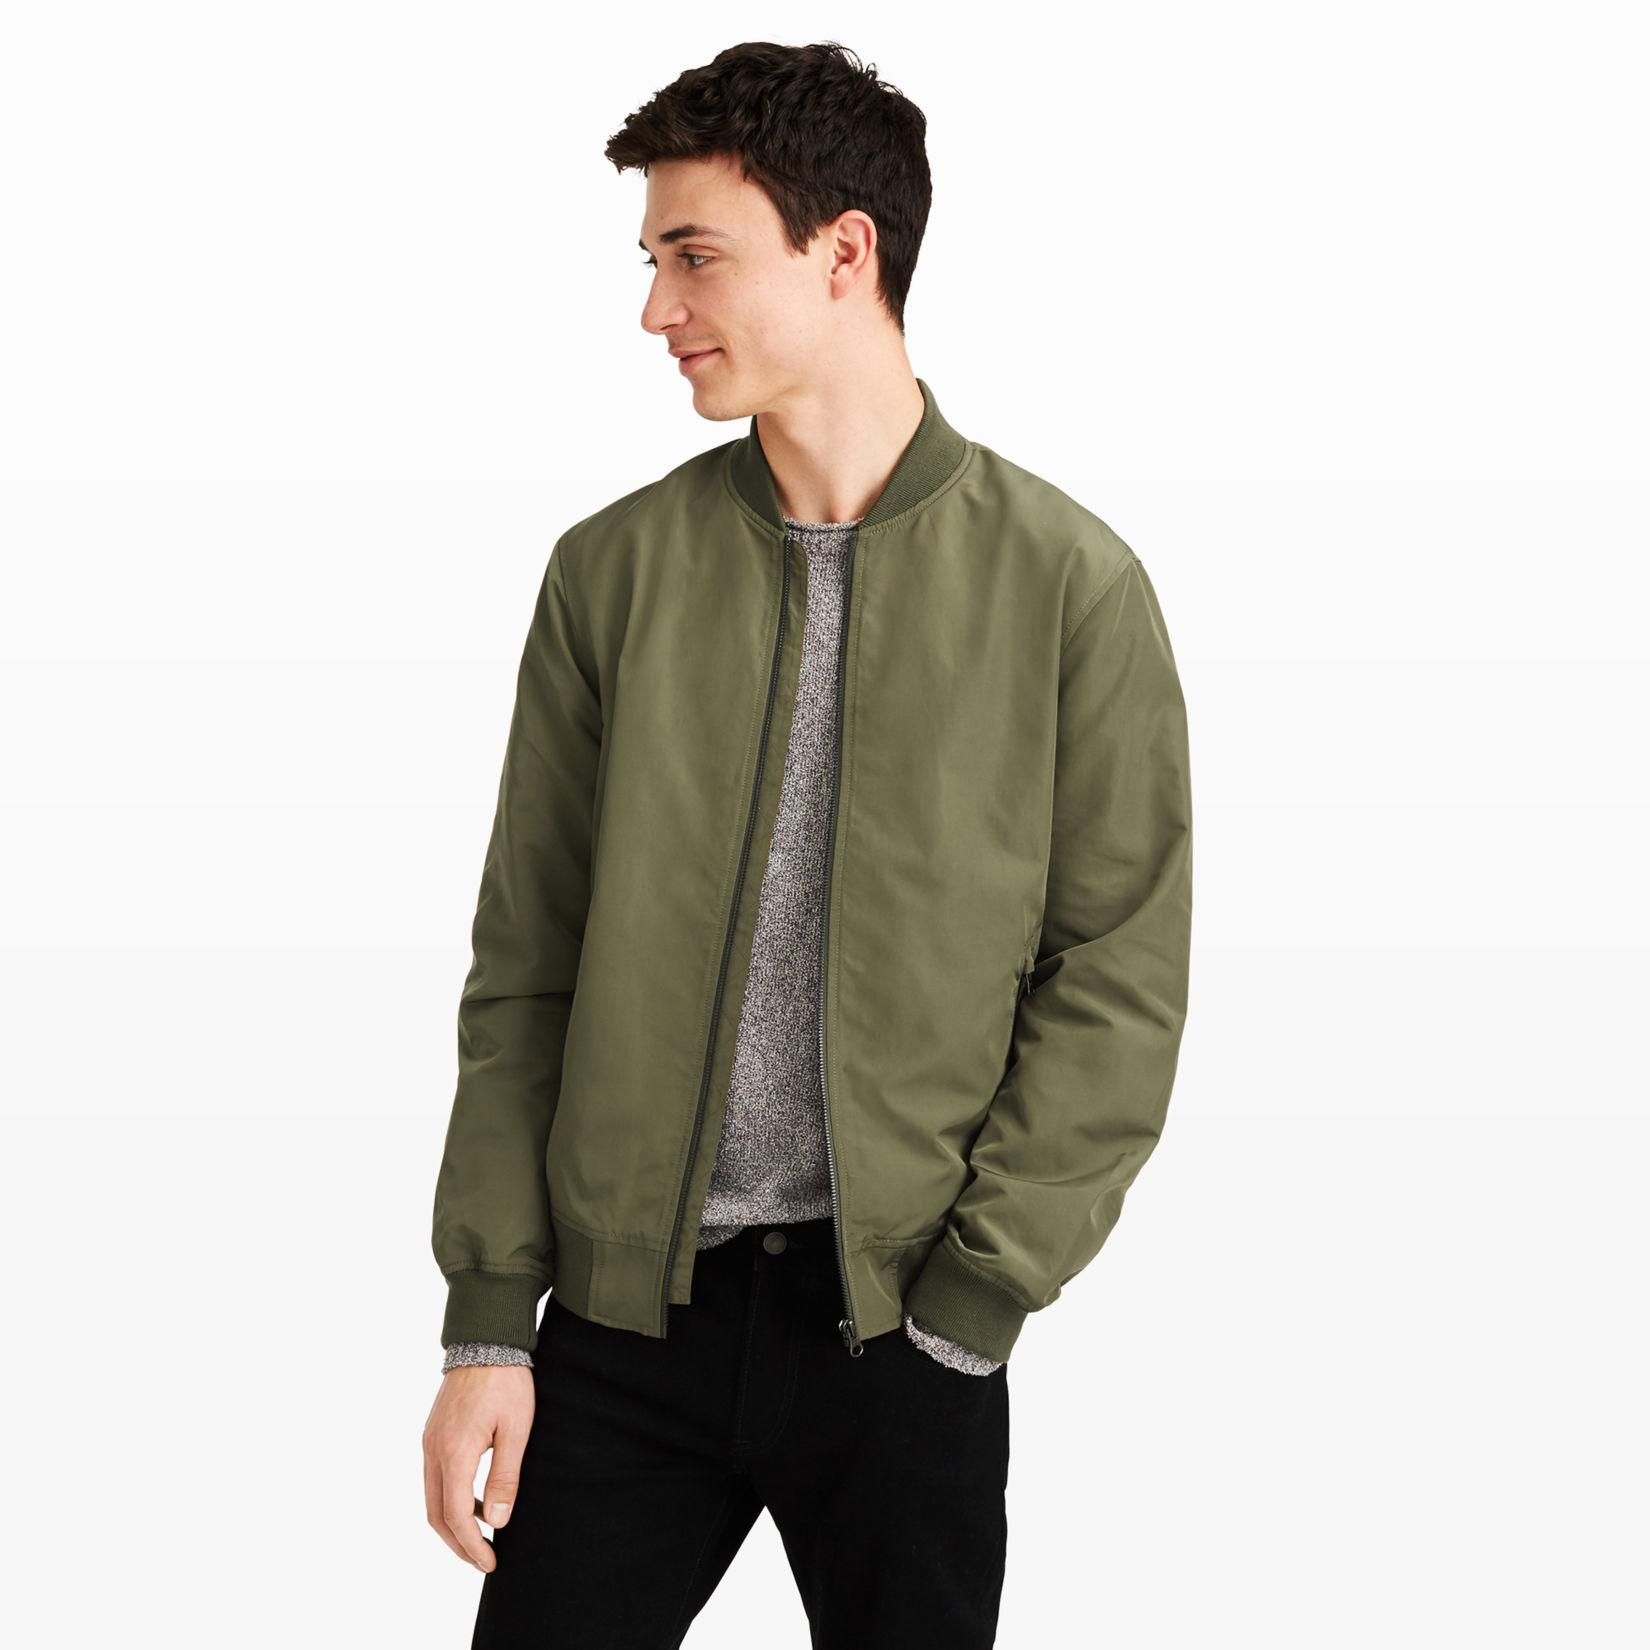 men outerwear ma 1 er jacket club monaco #1: p lifestyle flyout main iv rpsrf0 wid 1650 hei 1650 fit fit 1